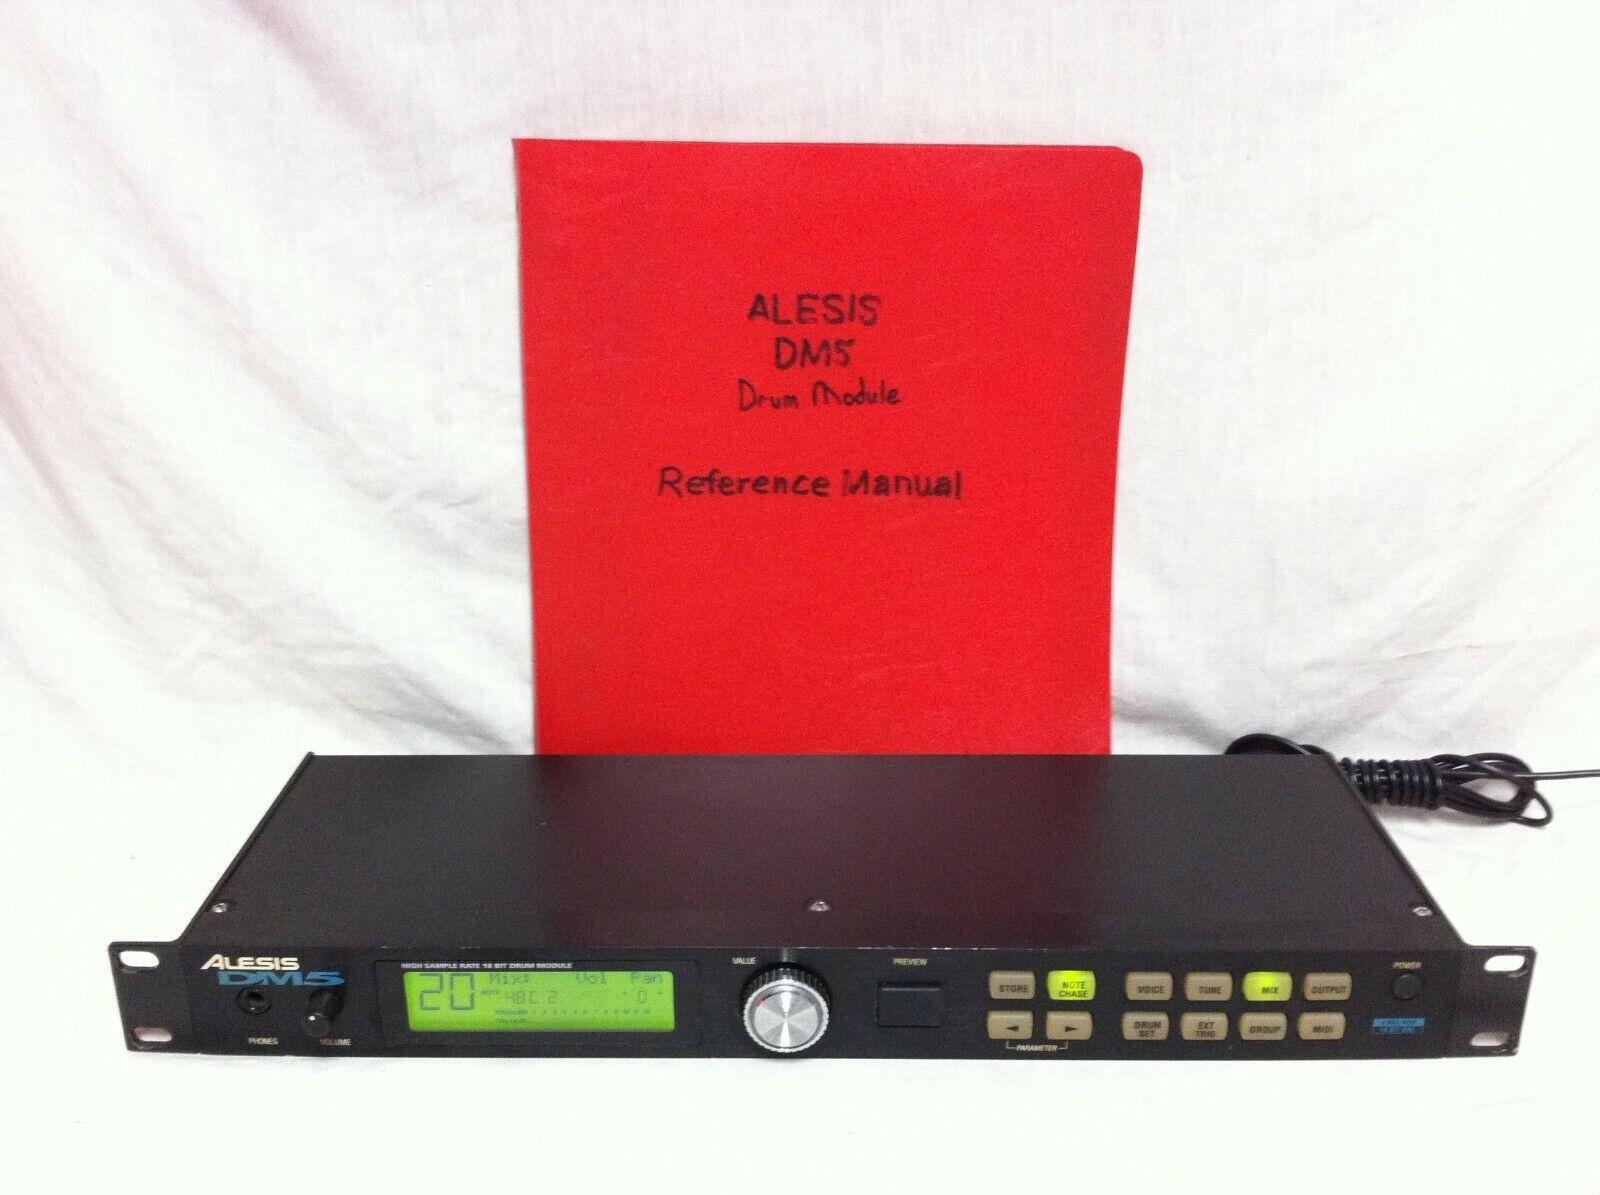 Rack Mount ALESIS DM5 Drum Control Module w  MANUAL High Sample Rate 18 Bit DM-5